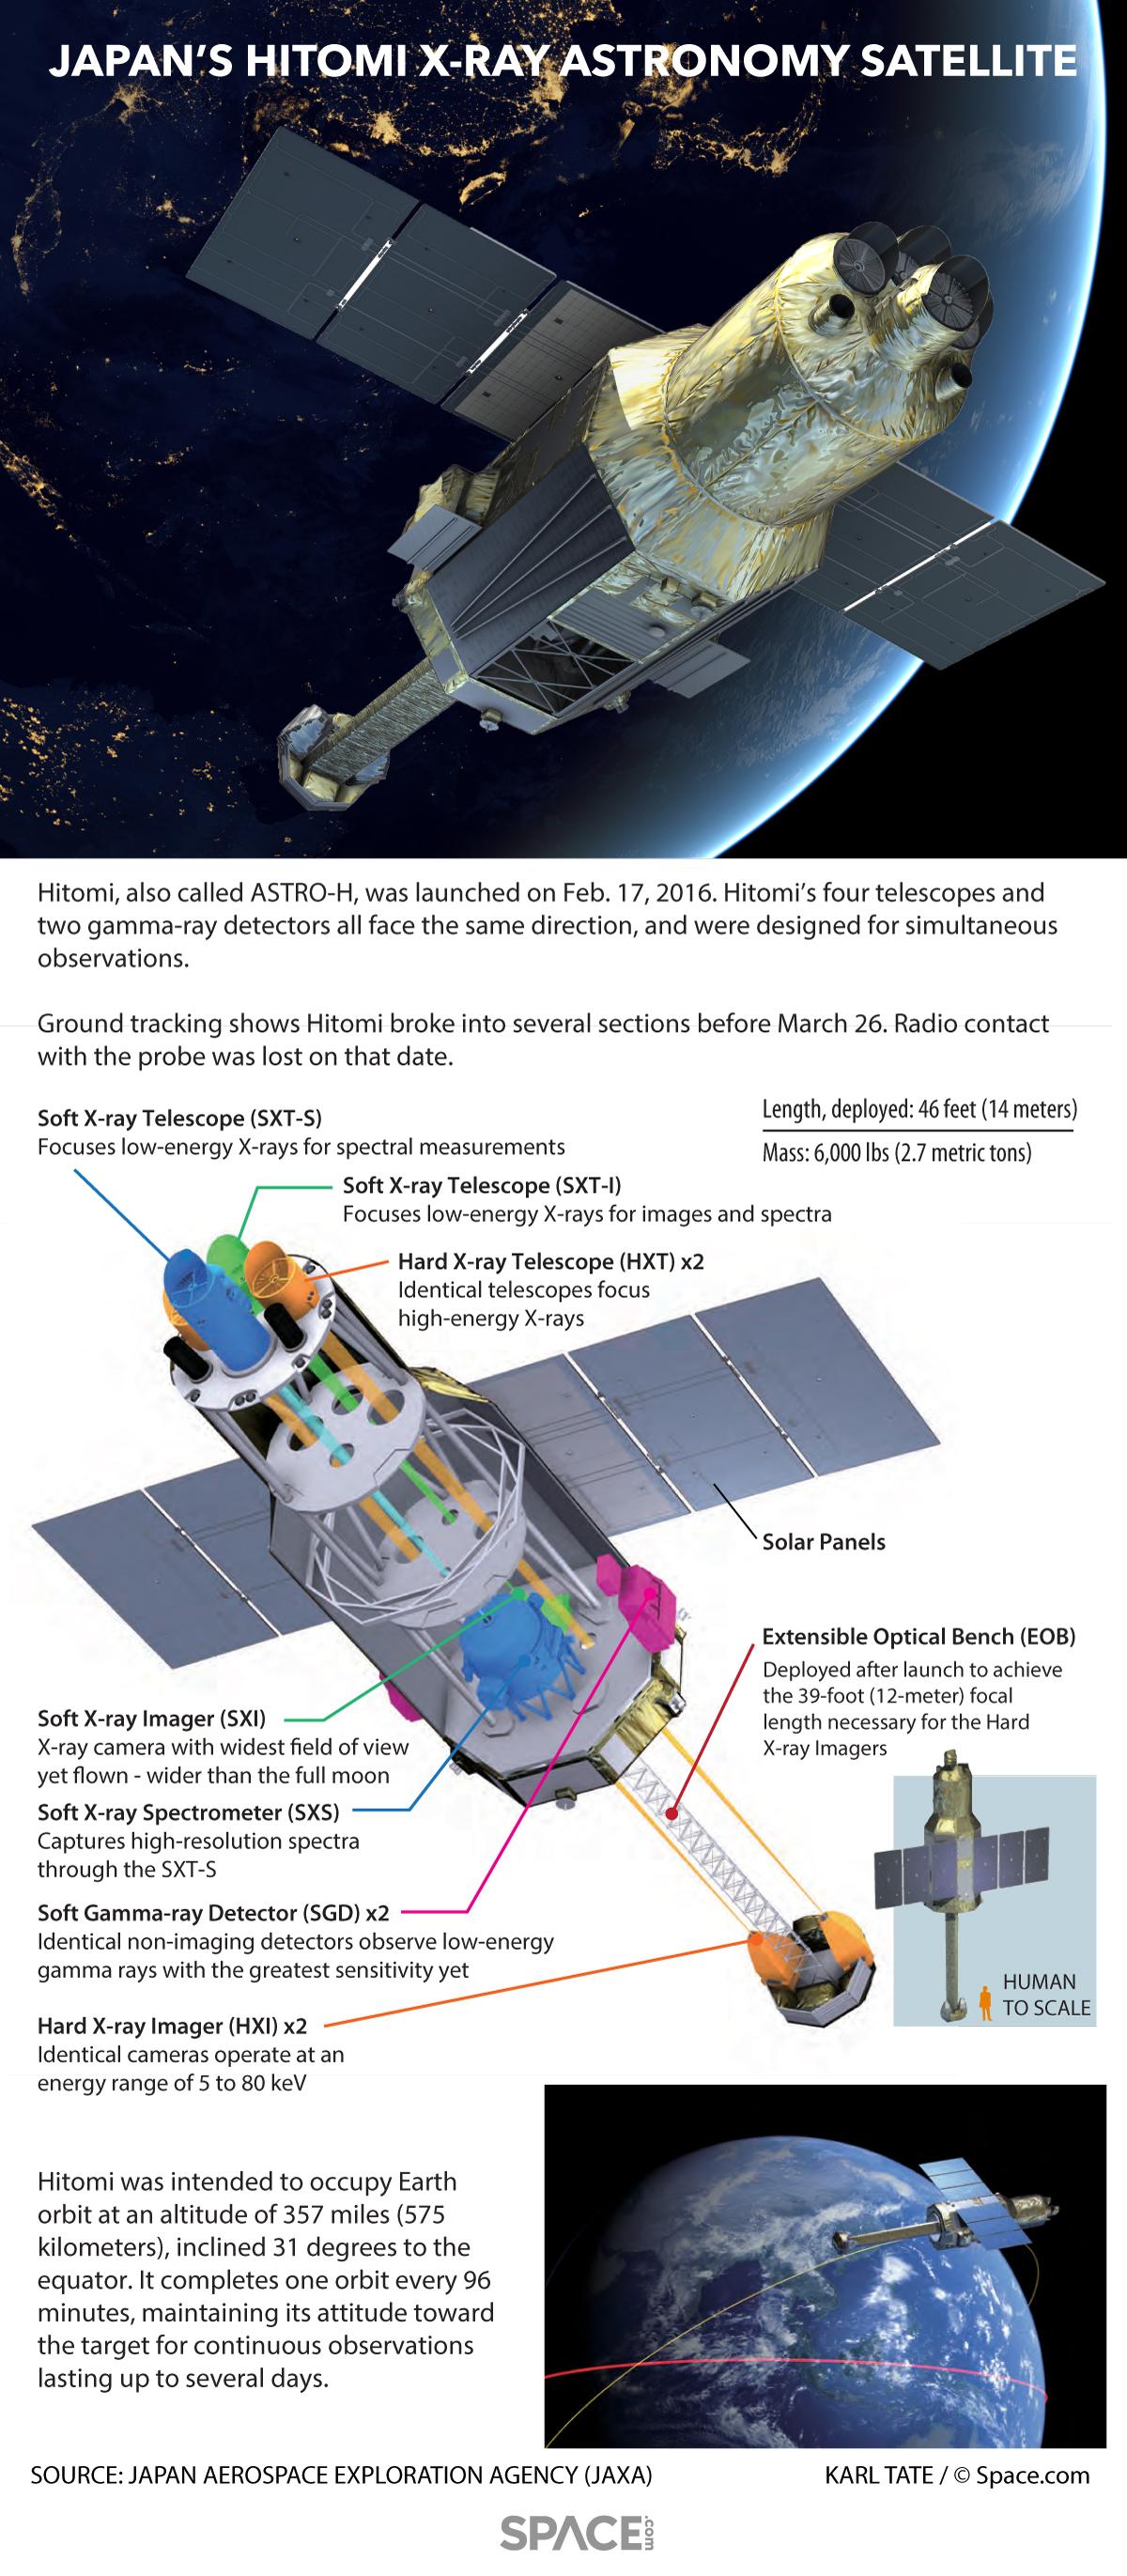 http://www.space.com/images/i/000/054/397/original/hitomi-jaxa-satellite-060328b-02.jpg?1459200289